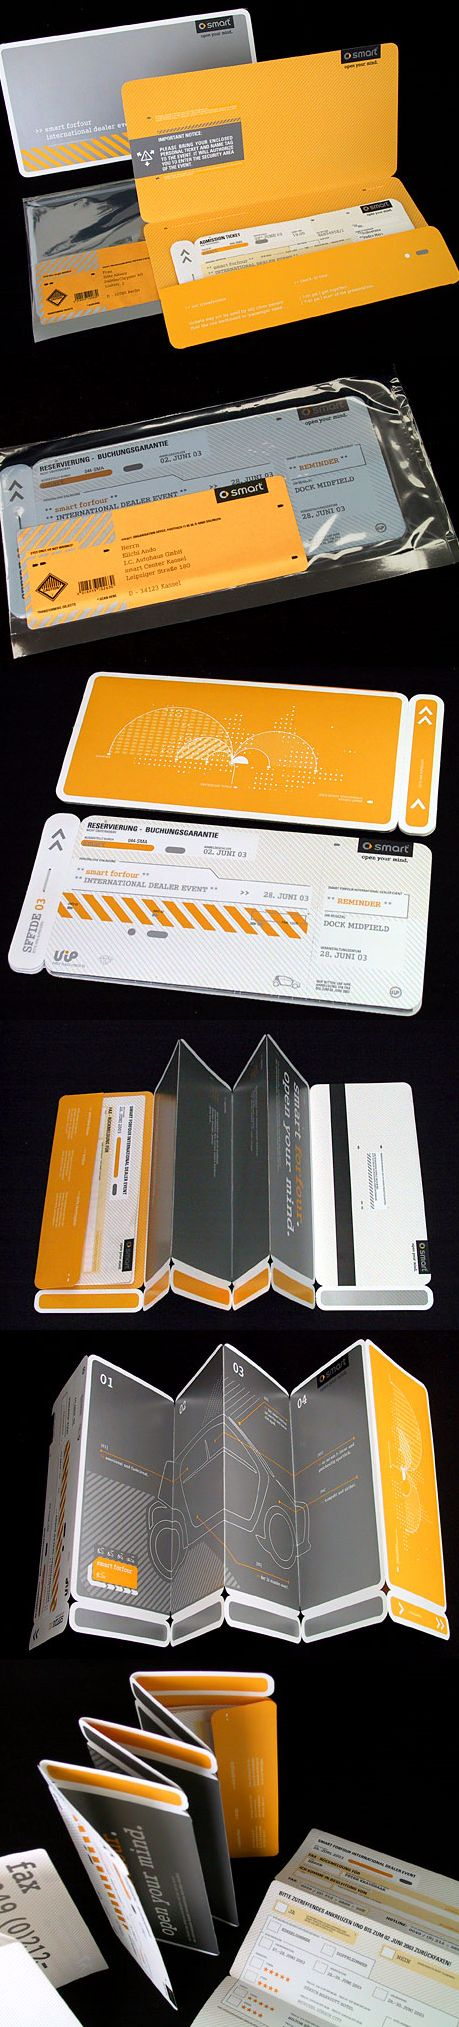 Amazing Direct Mail Design #design #print #graphic